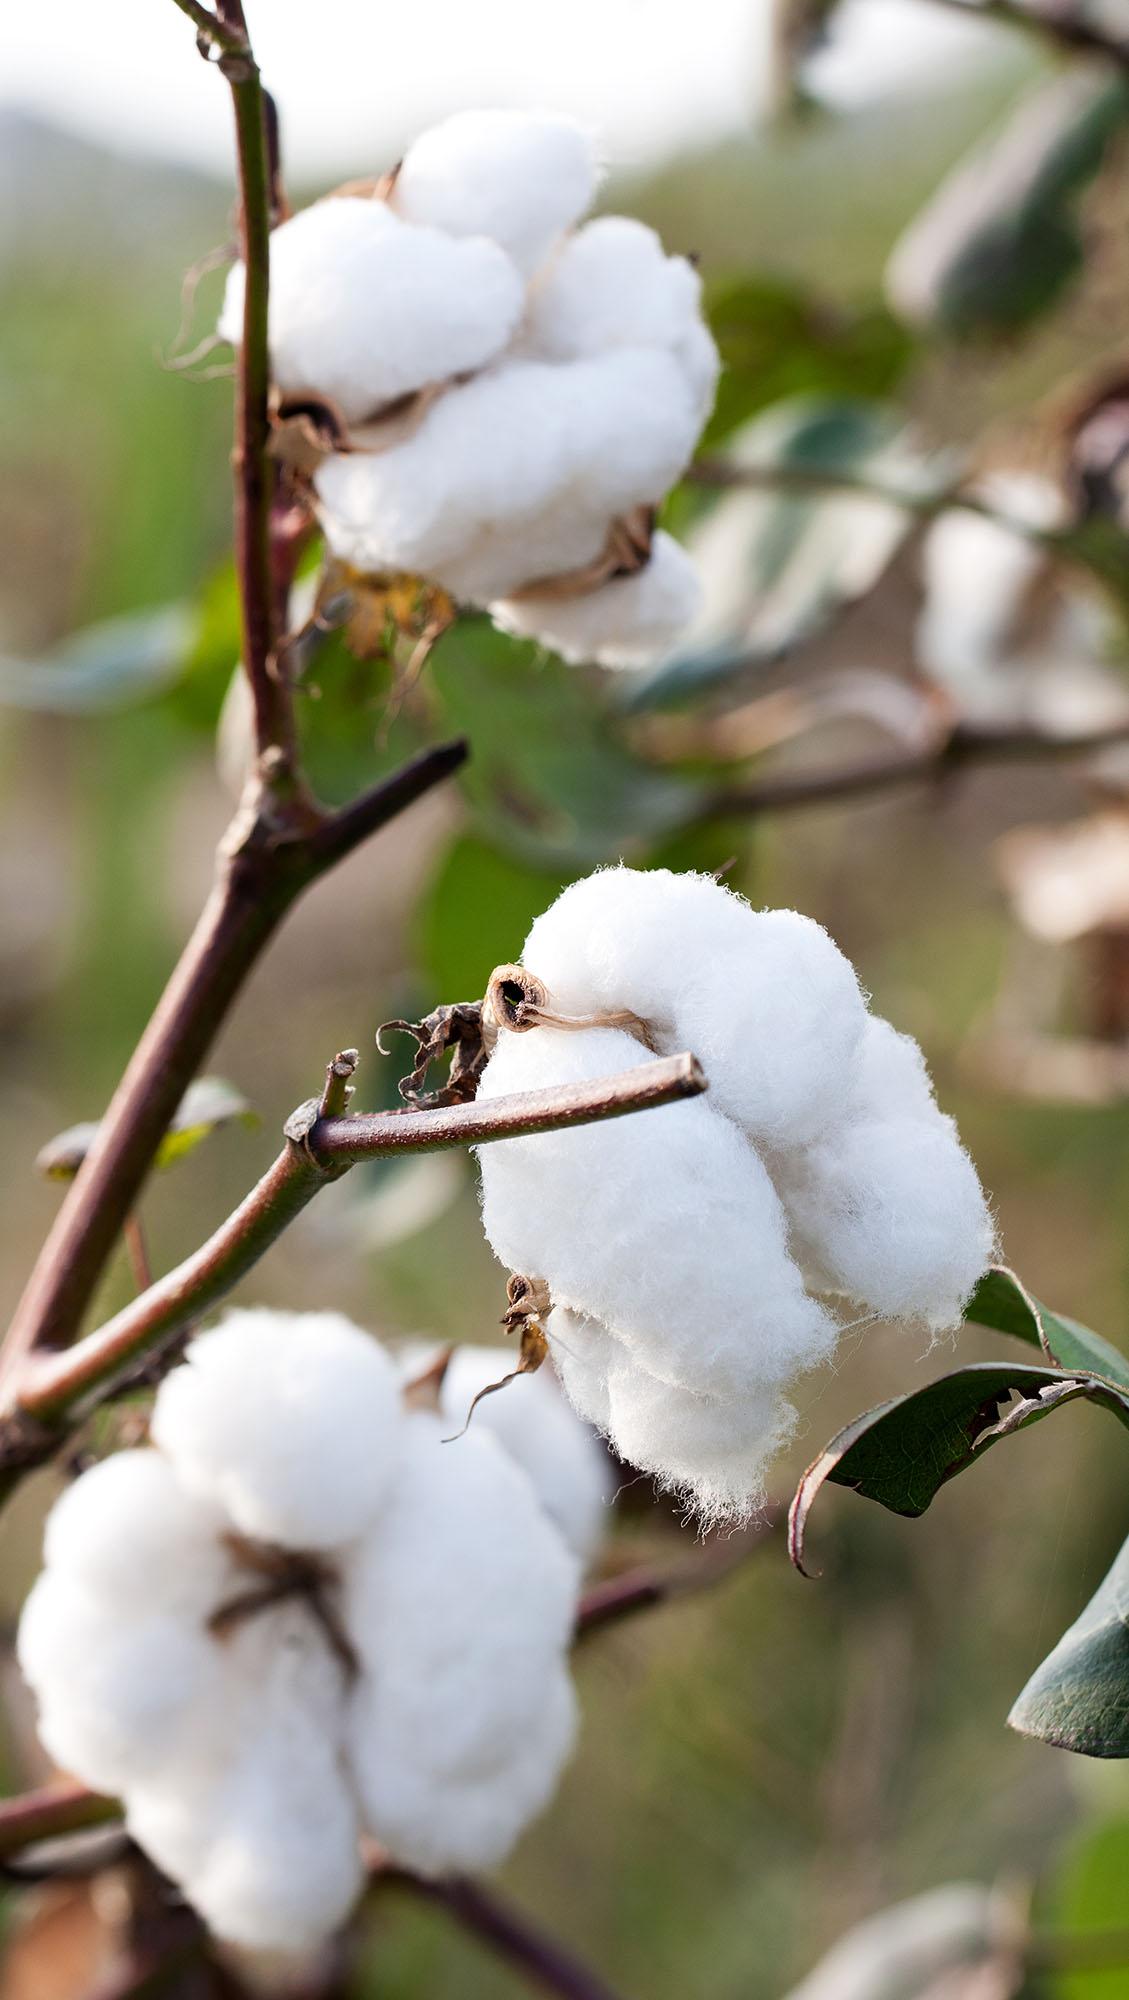 Bio-Baumwoll-Frucht    Organic cotton plant